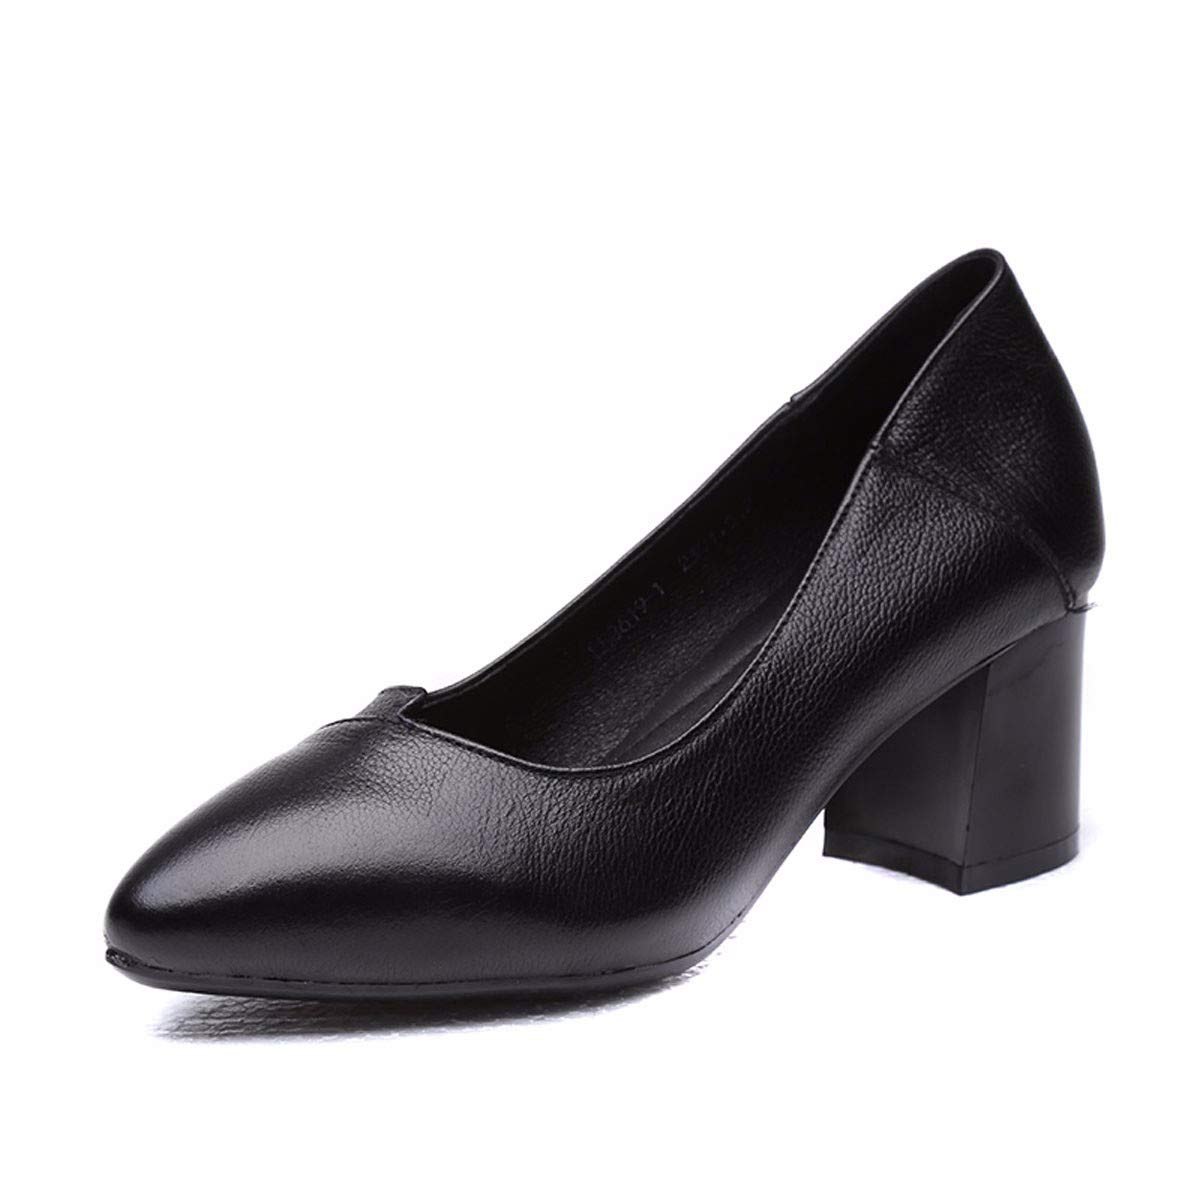 KPHY Damenschuhe/Meine Damen Lederschuhe Einzelne Lässige Schuhe Lässige Einzelne Scherze Flachen Boden Flach Mund Hart Arbeiten Schuhe Damenschuhe.39 Schwarz 78f512